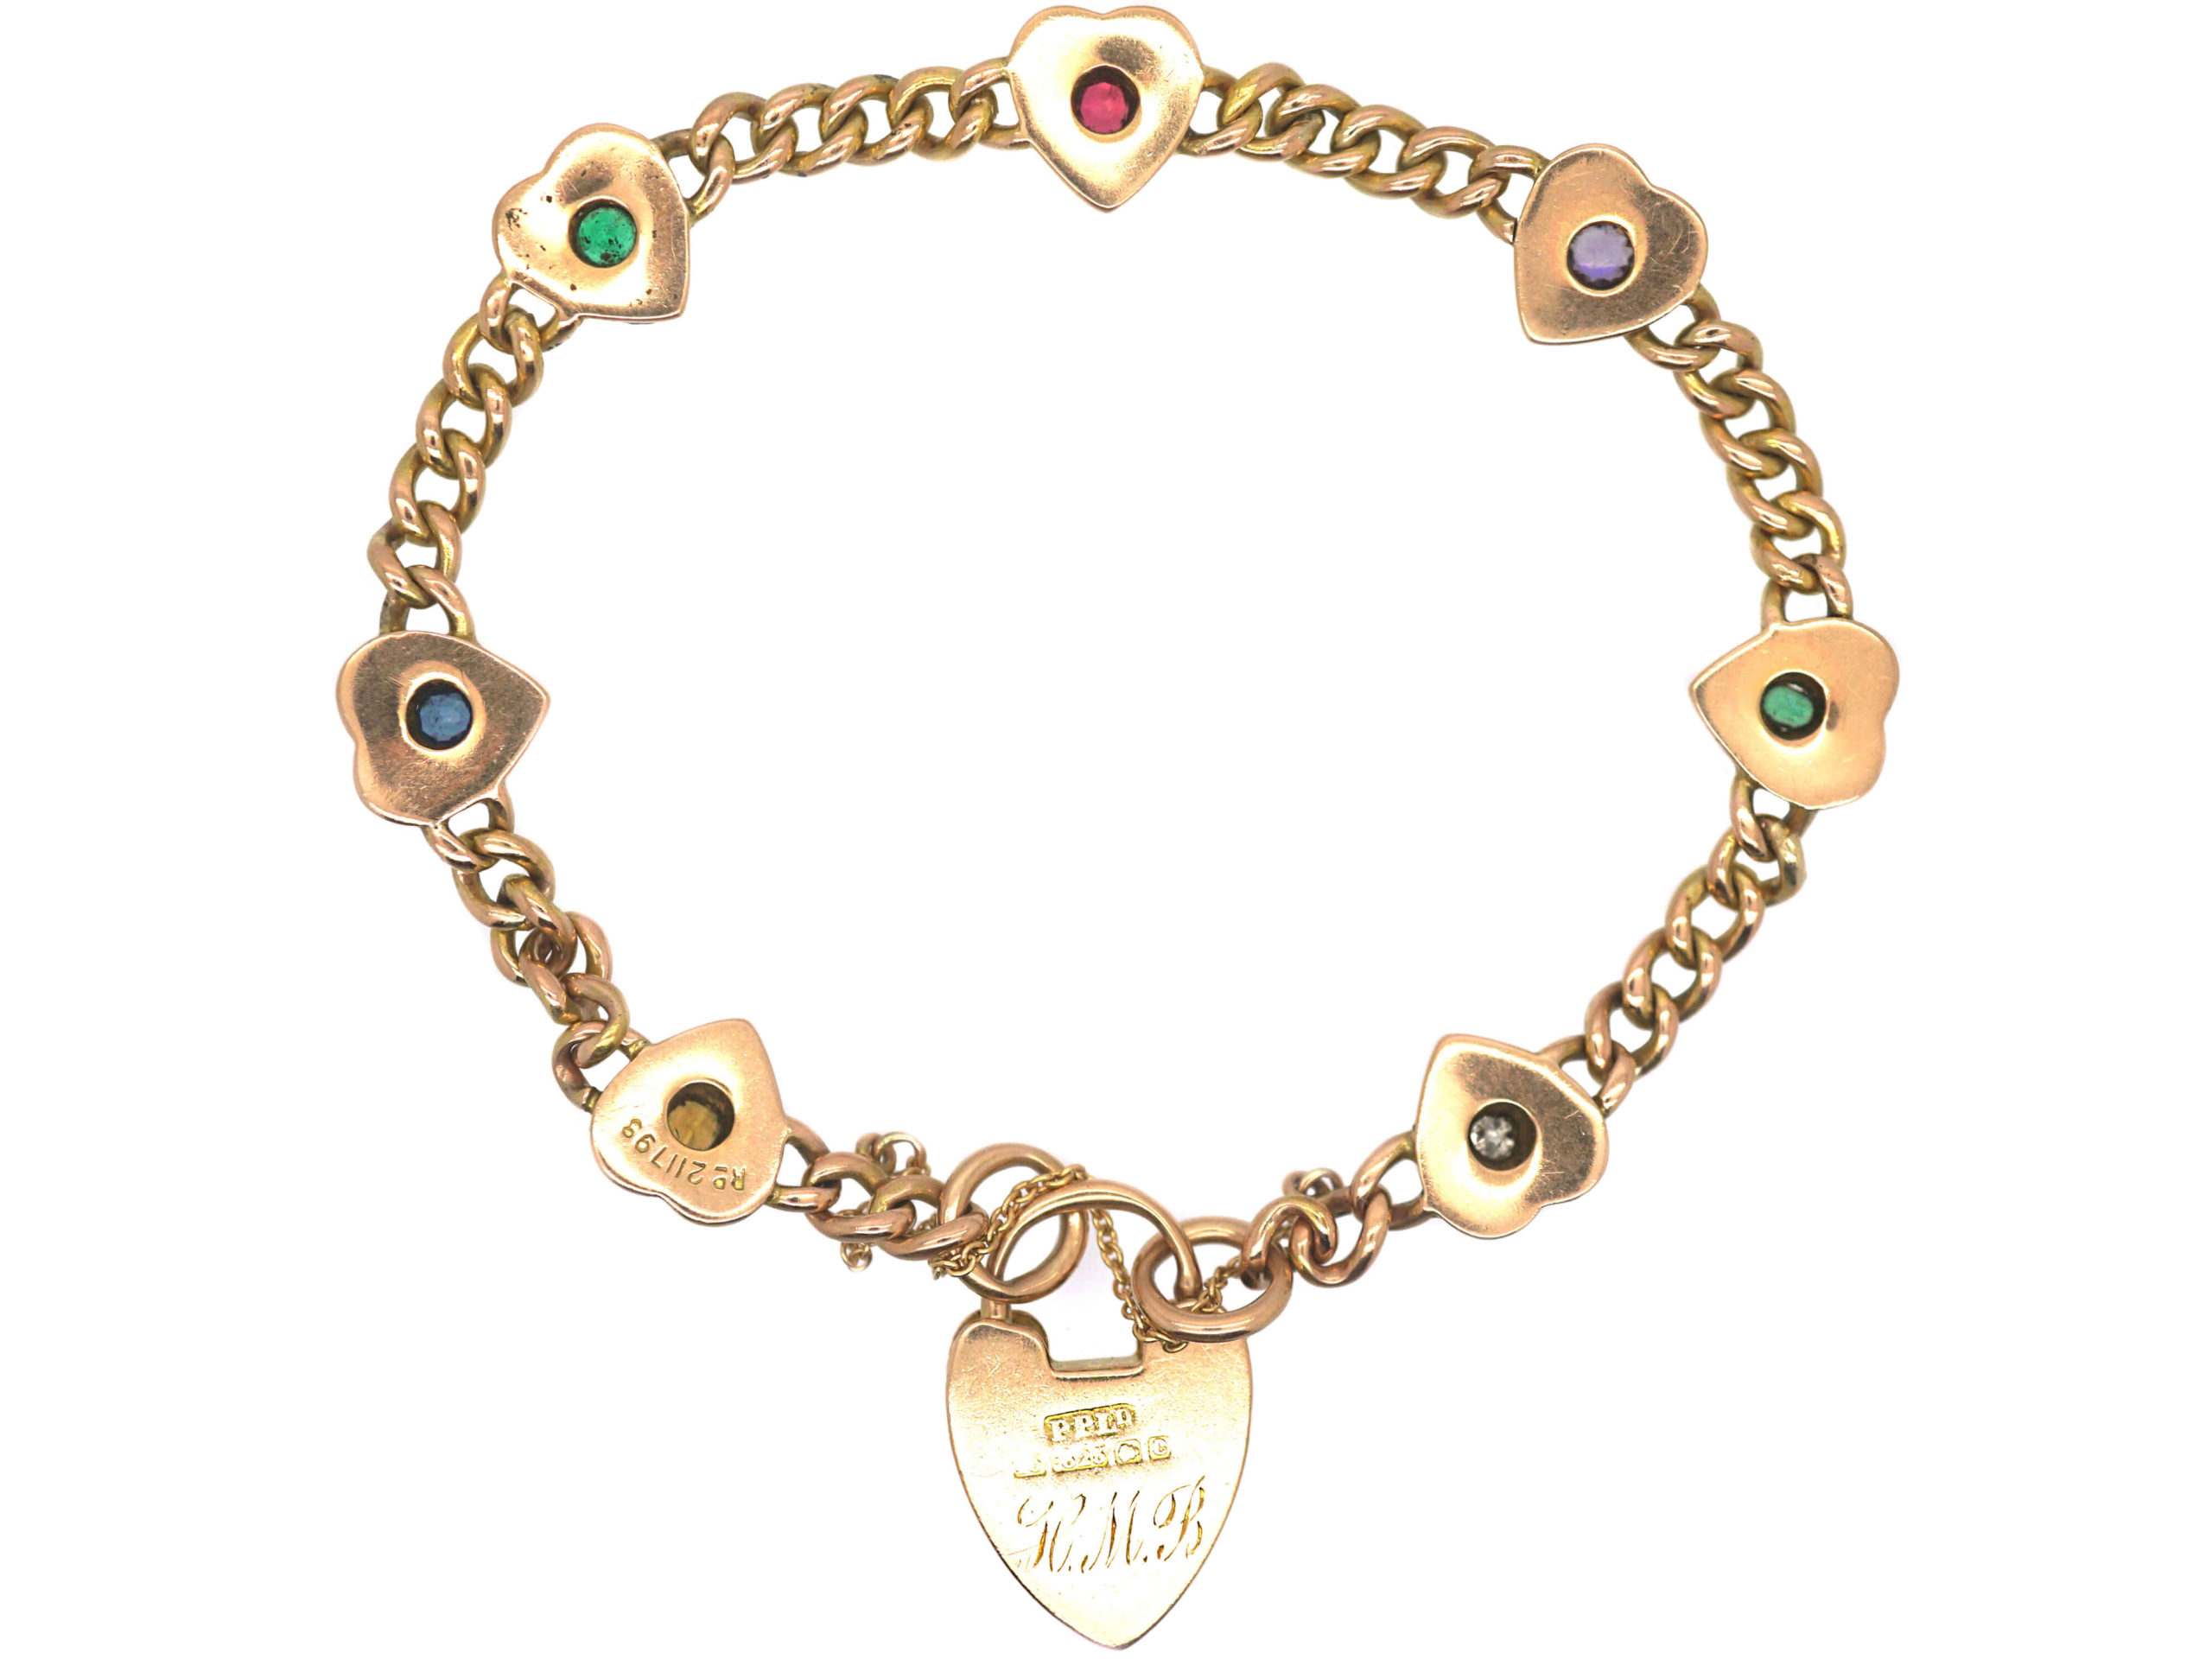 Edwardian 15ct Gold Hearts & Curb Motif Bracelet set with Gemstones that Spell Dearest